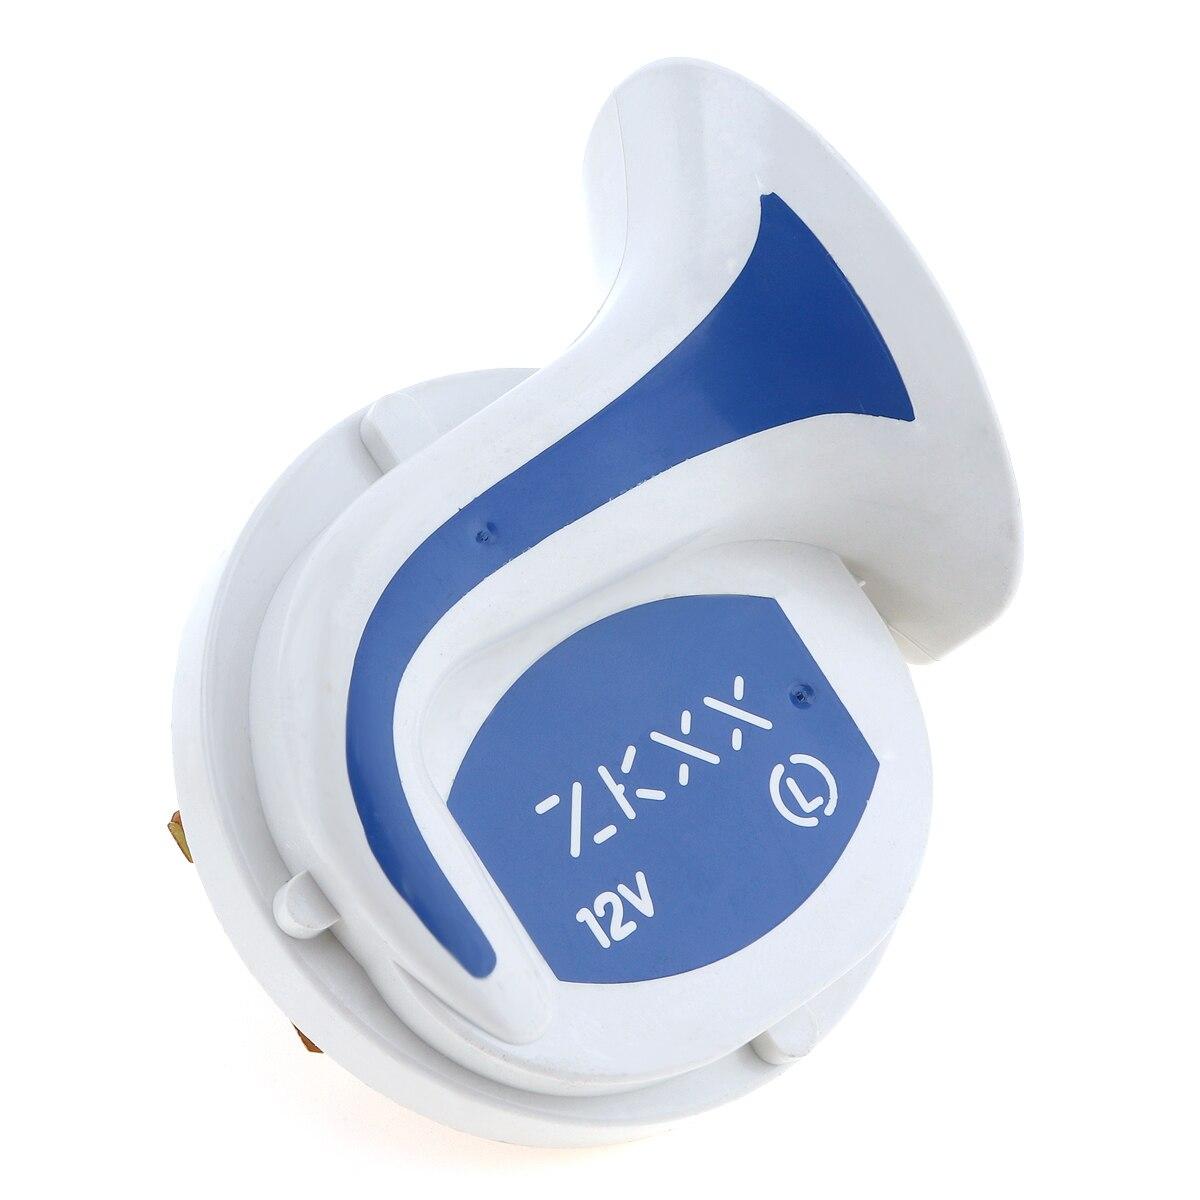 Loud Horn Auto Speaker Alarm 2V 150db Tone Vehicle Boat Car Motor ...